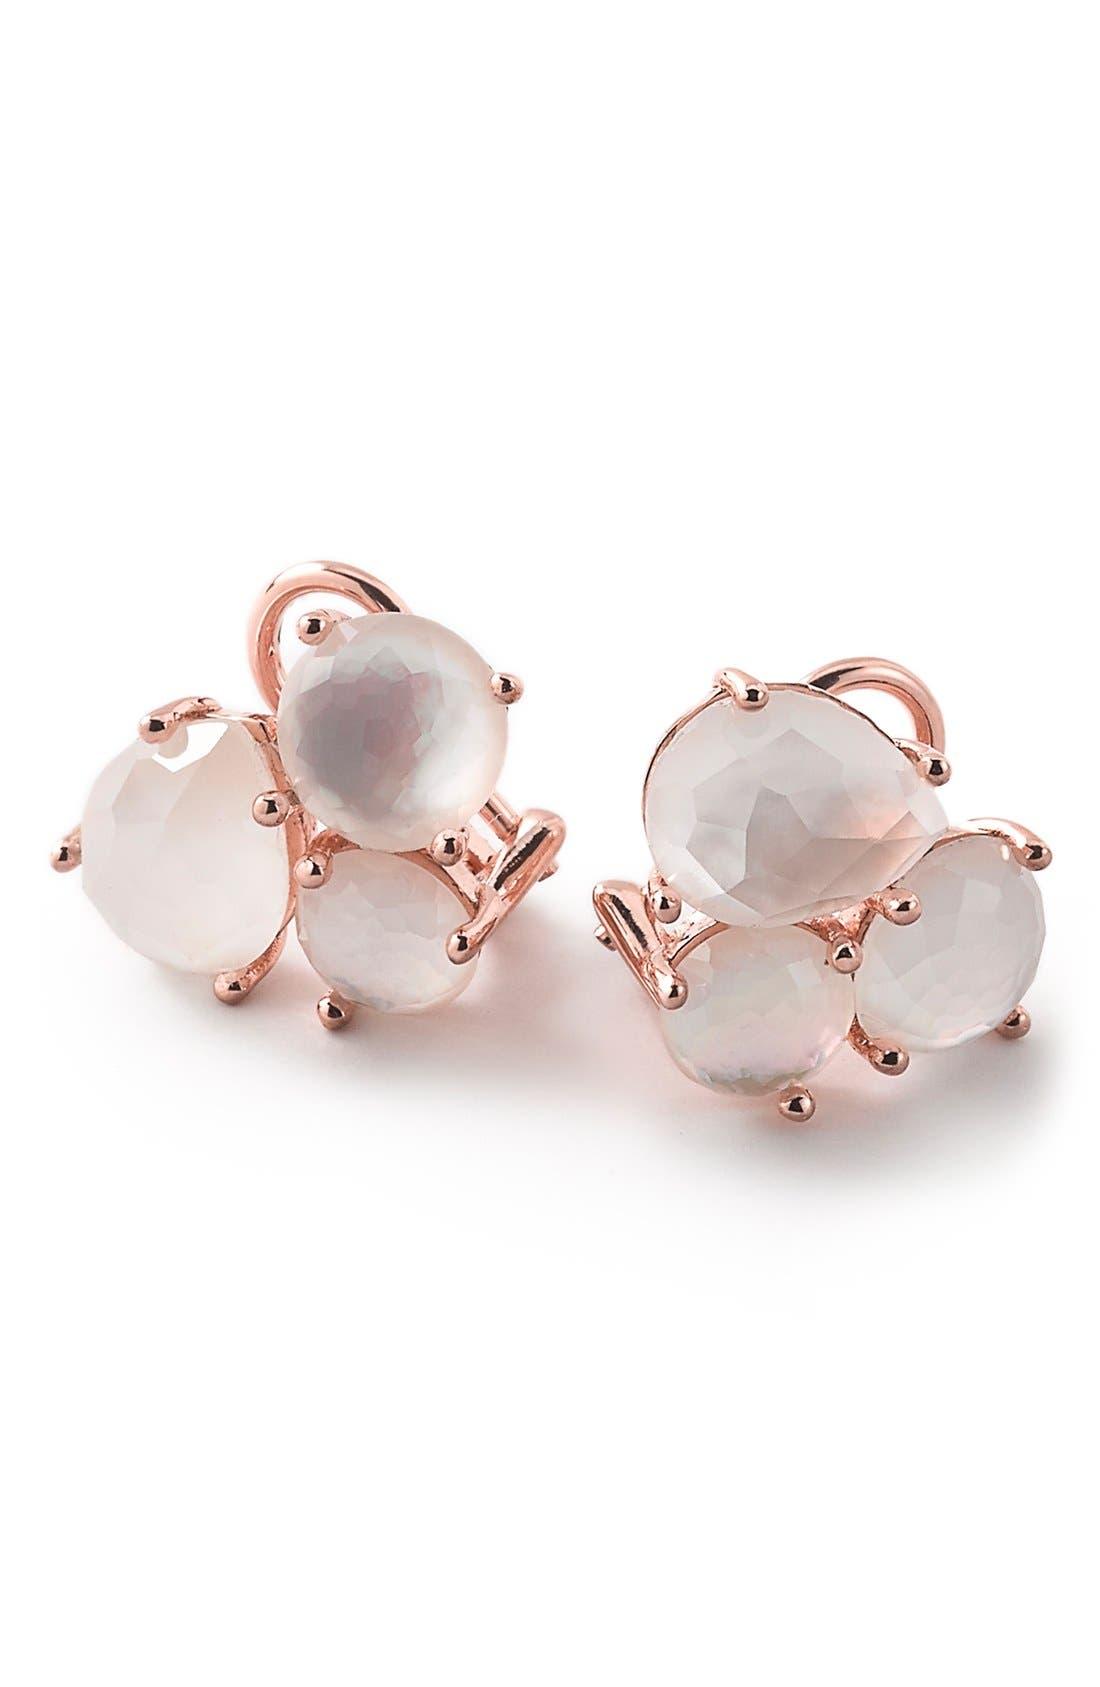 Main Image - Ippolita 'Rock Candy' Cluster Stud Earrings